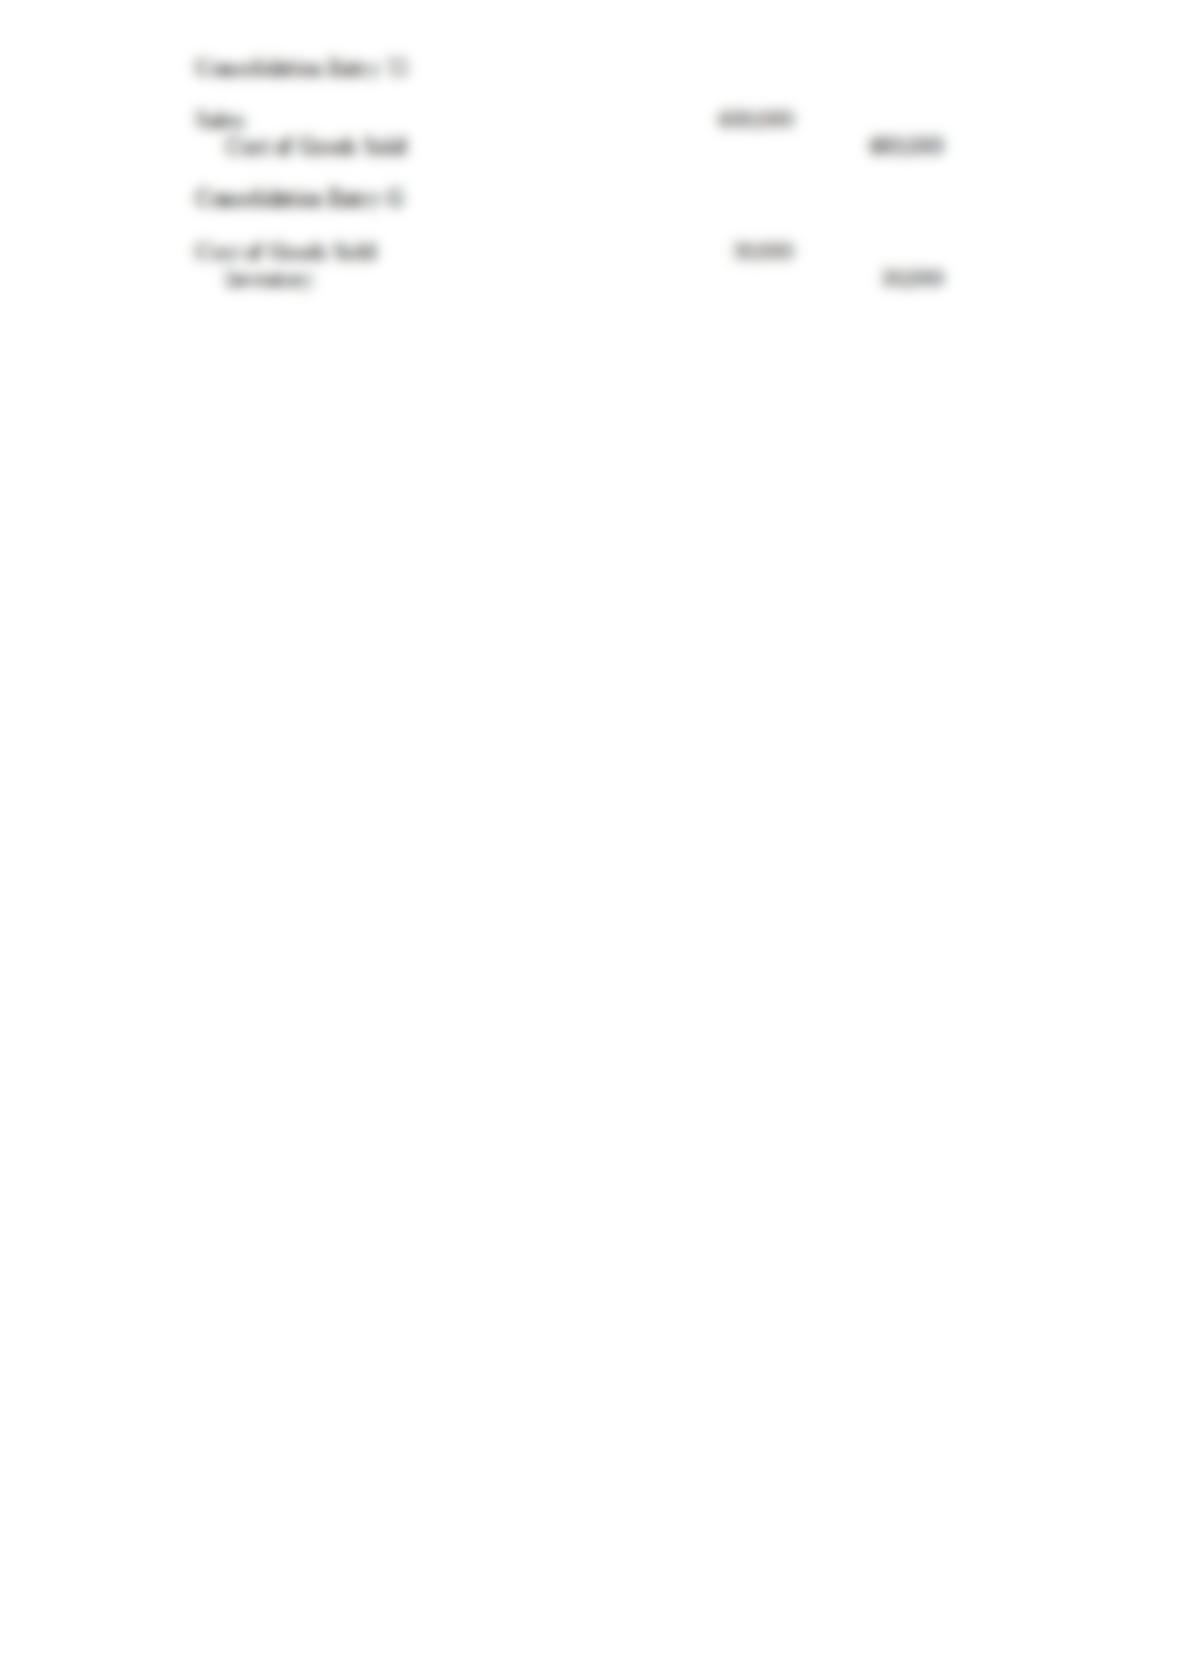 Accounting 644 Quiz 2